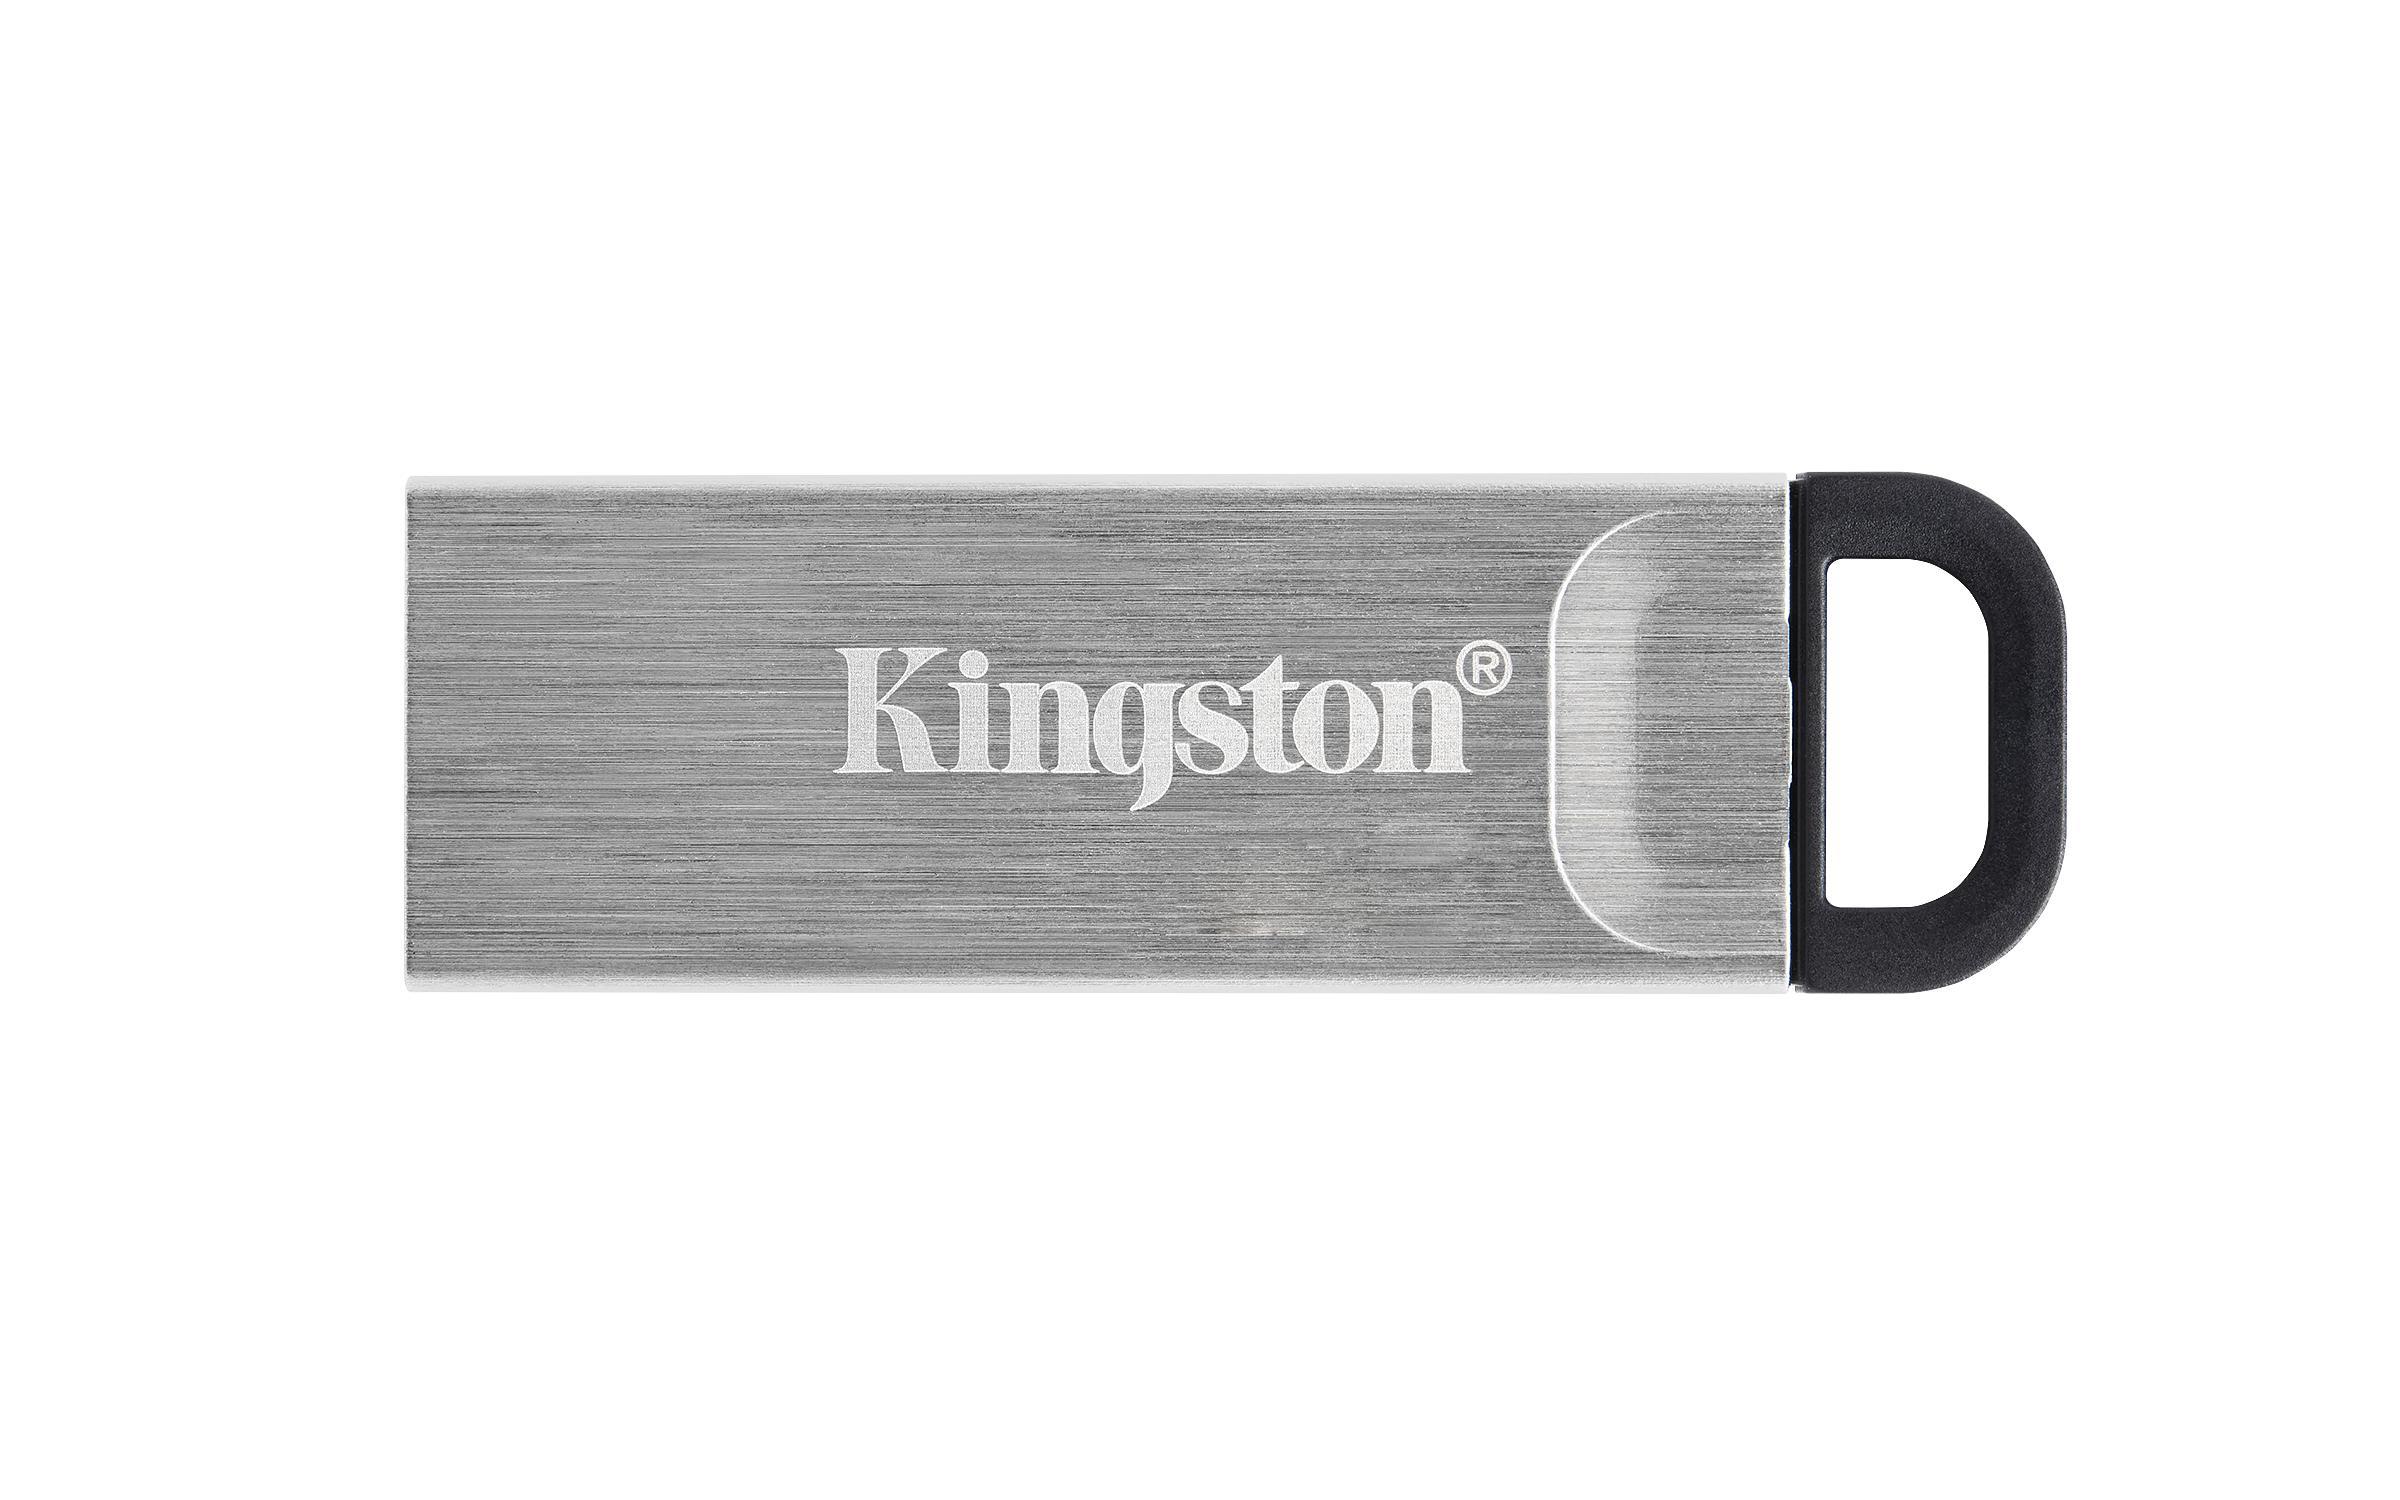 USB памет KINGSTON DataTraveler Kyson 256GB, USB 3.2 Gen 1, Сребрист